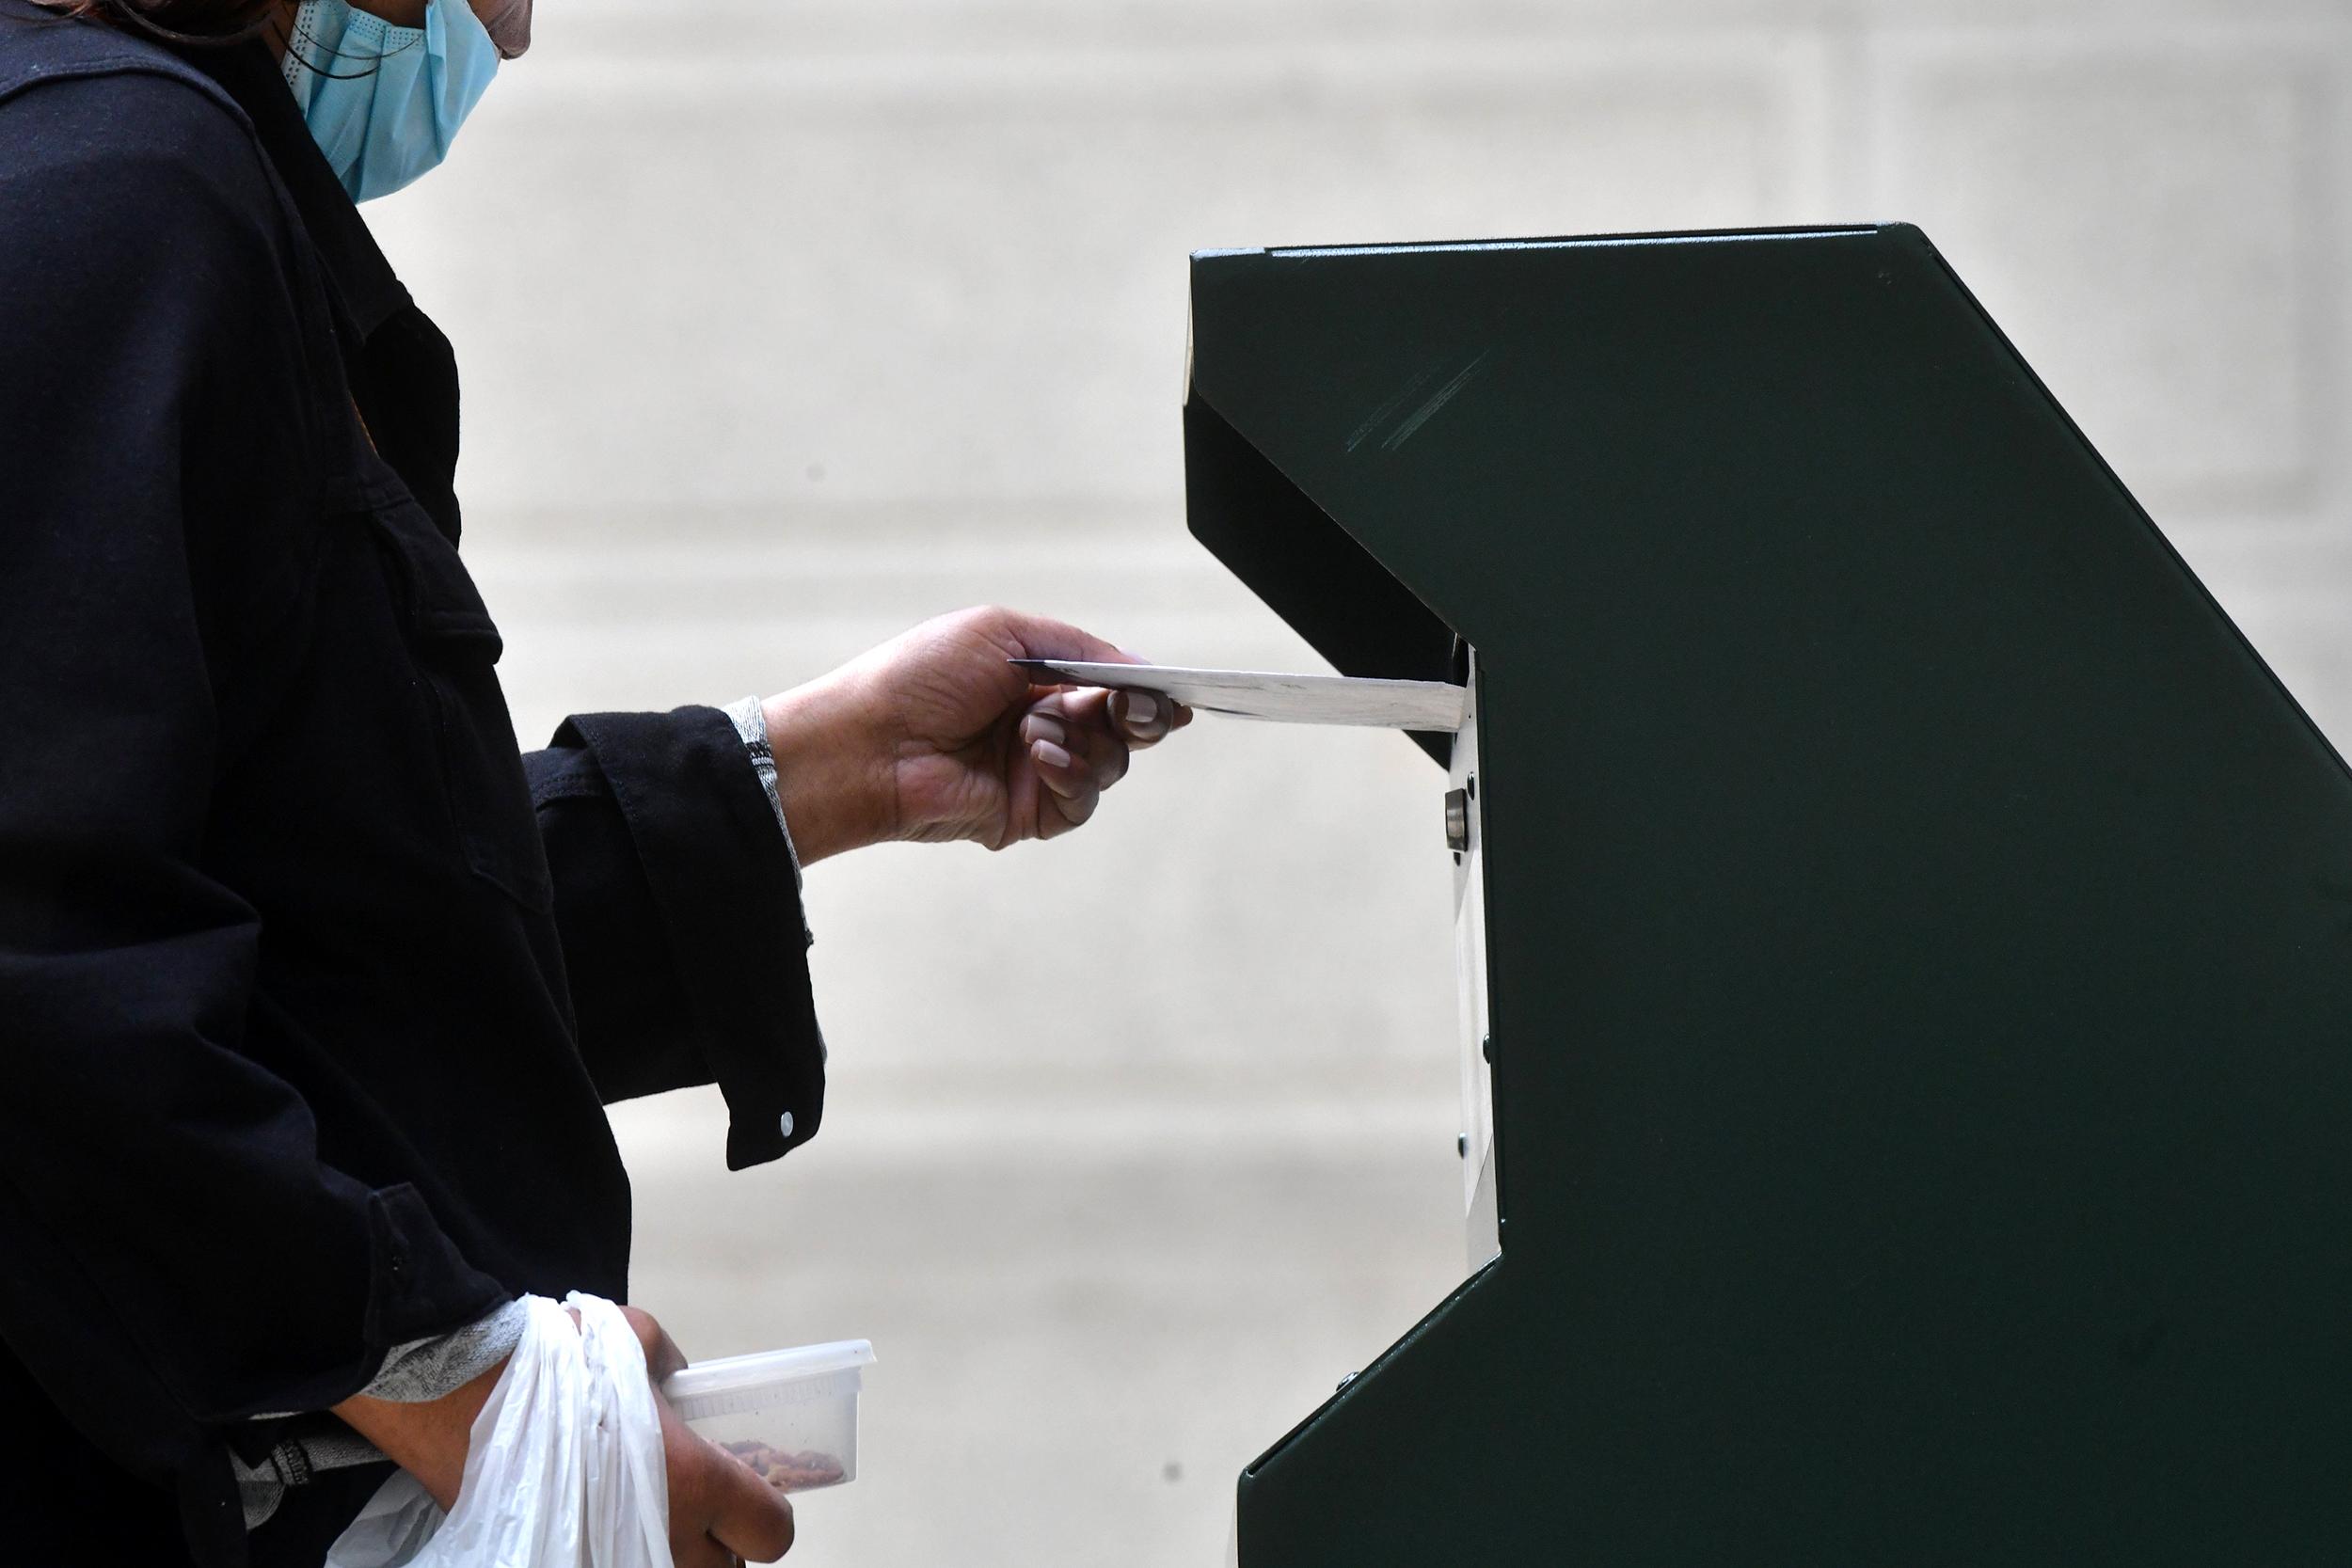 201029-philadelphia-ballot-drop-box-ac-6